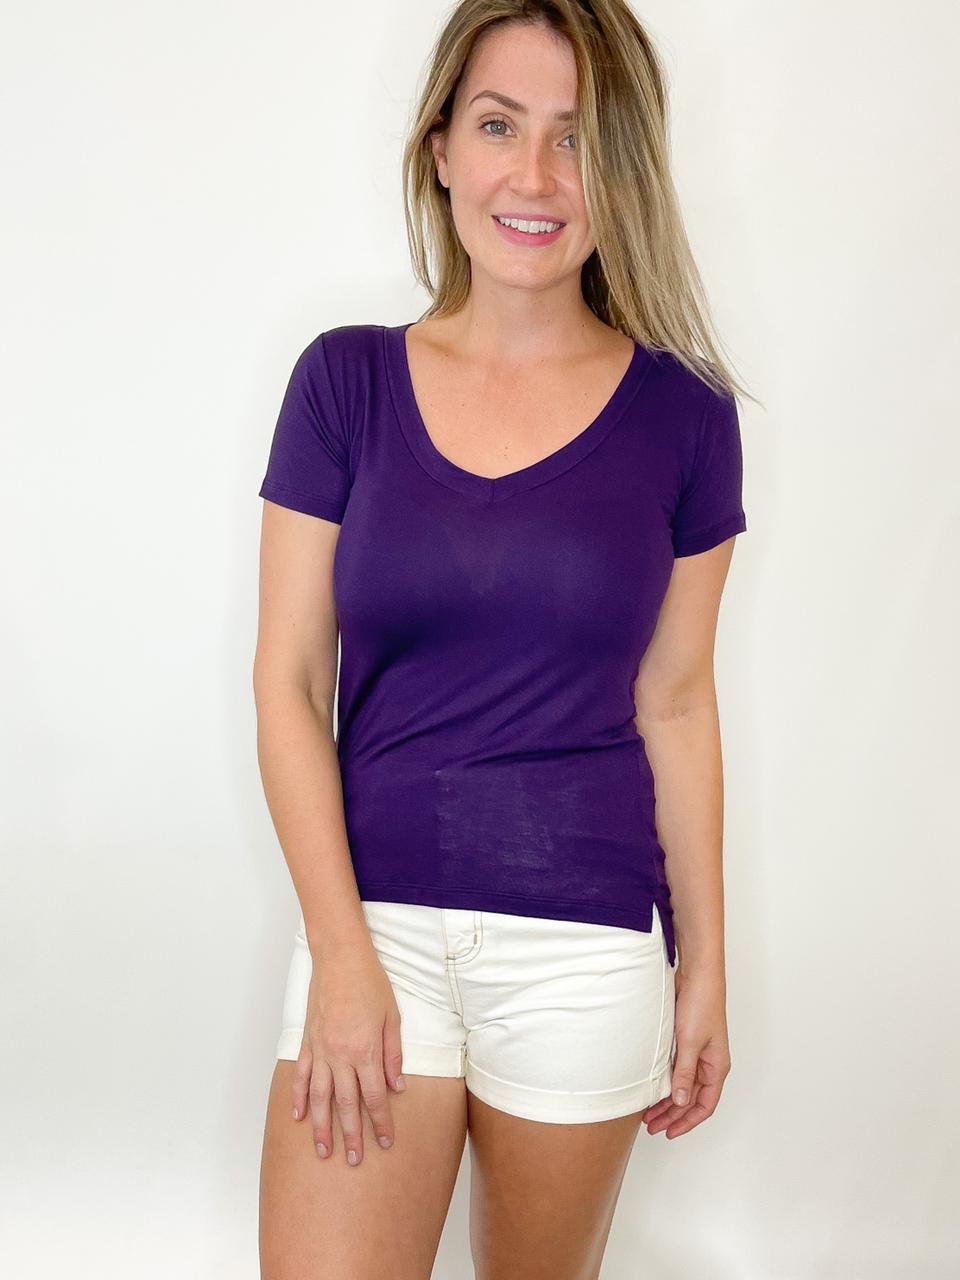 Camiseta Podrinha roxa escura